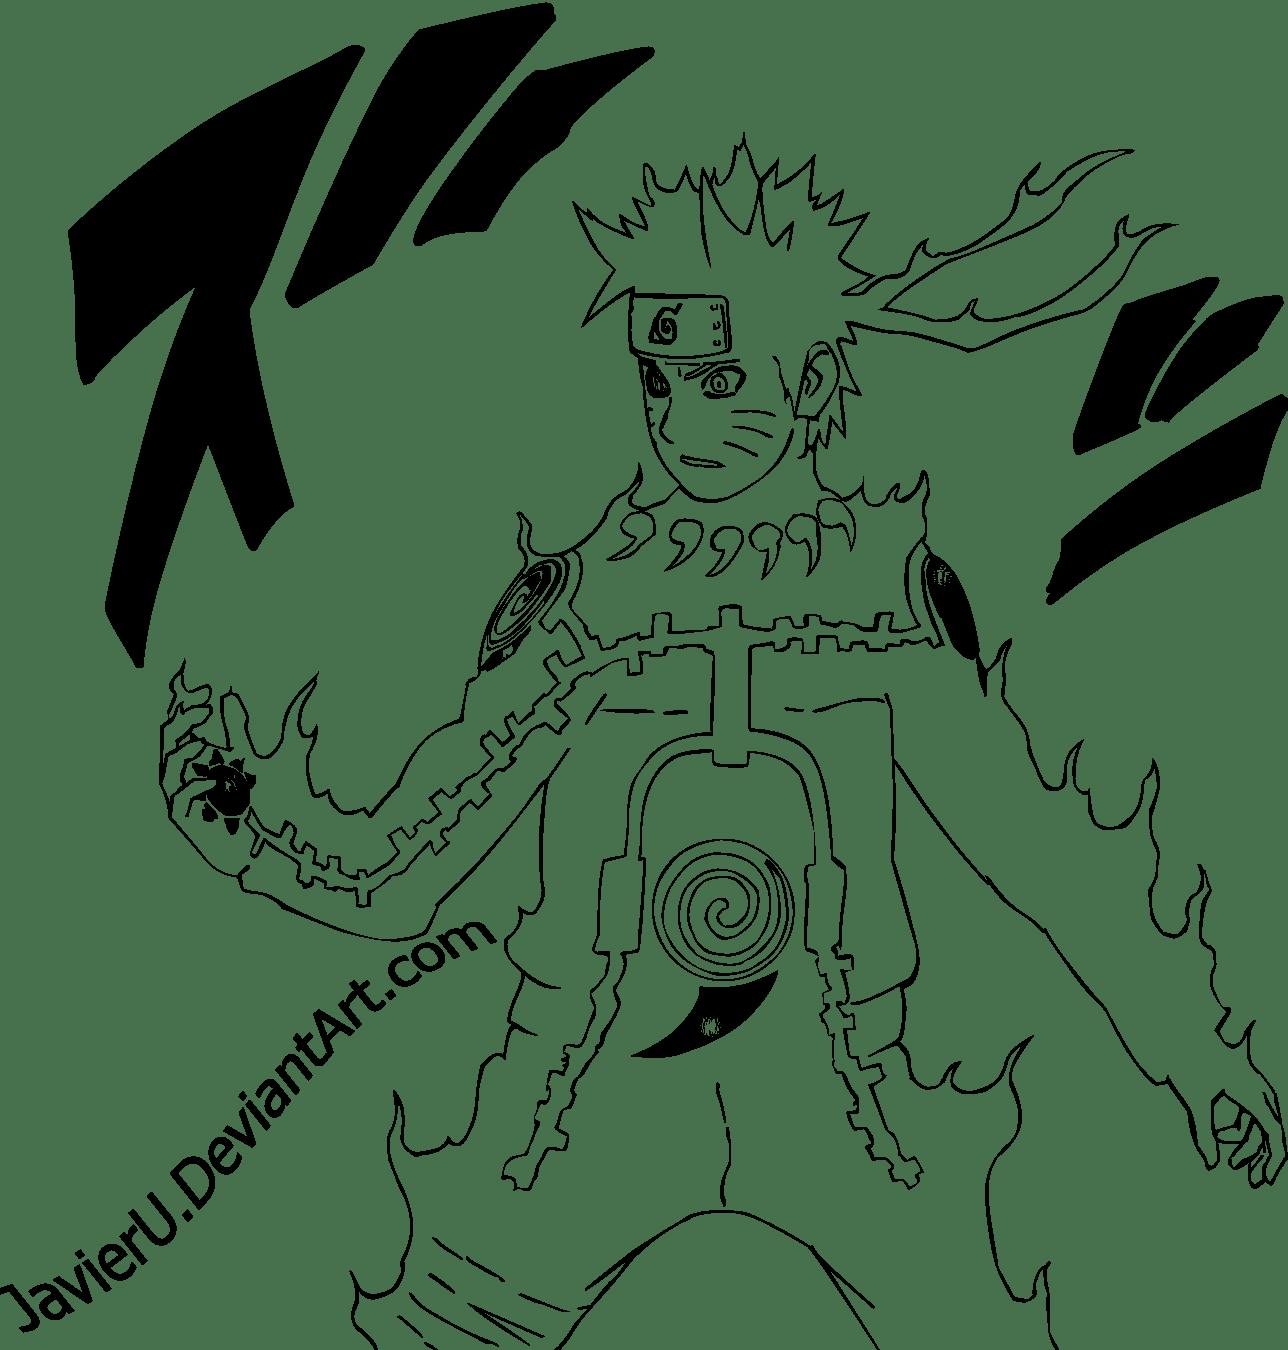 Desenhos Para Colorir E Imprimir Do Naruto Shippuden – Pampekids Net